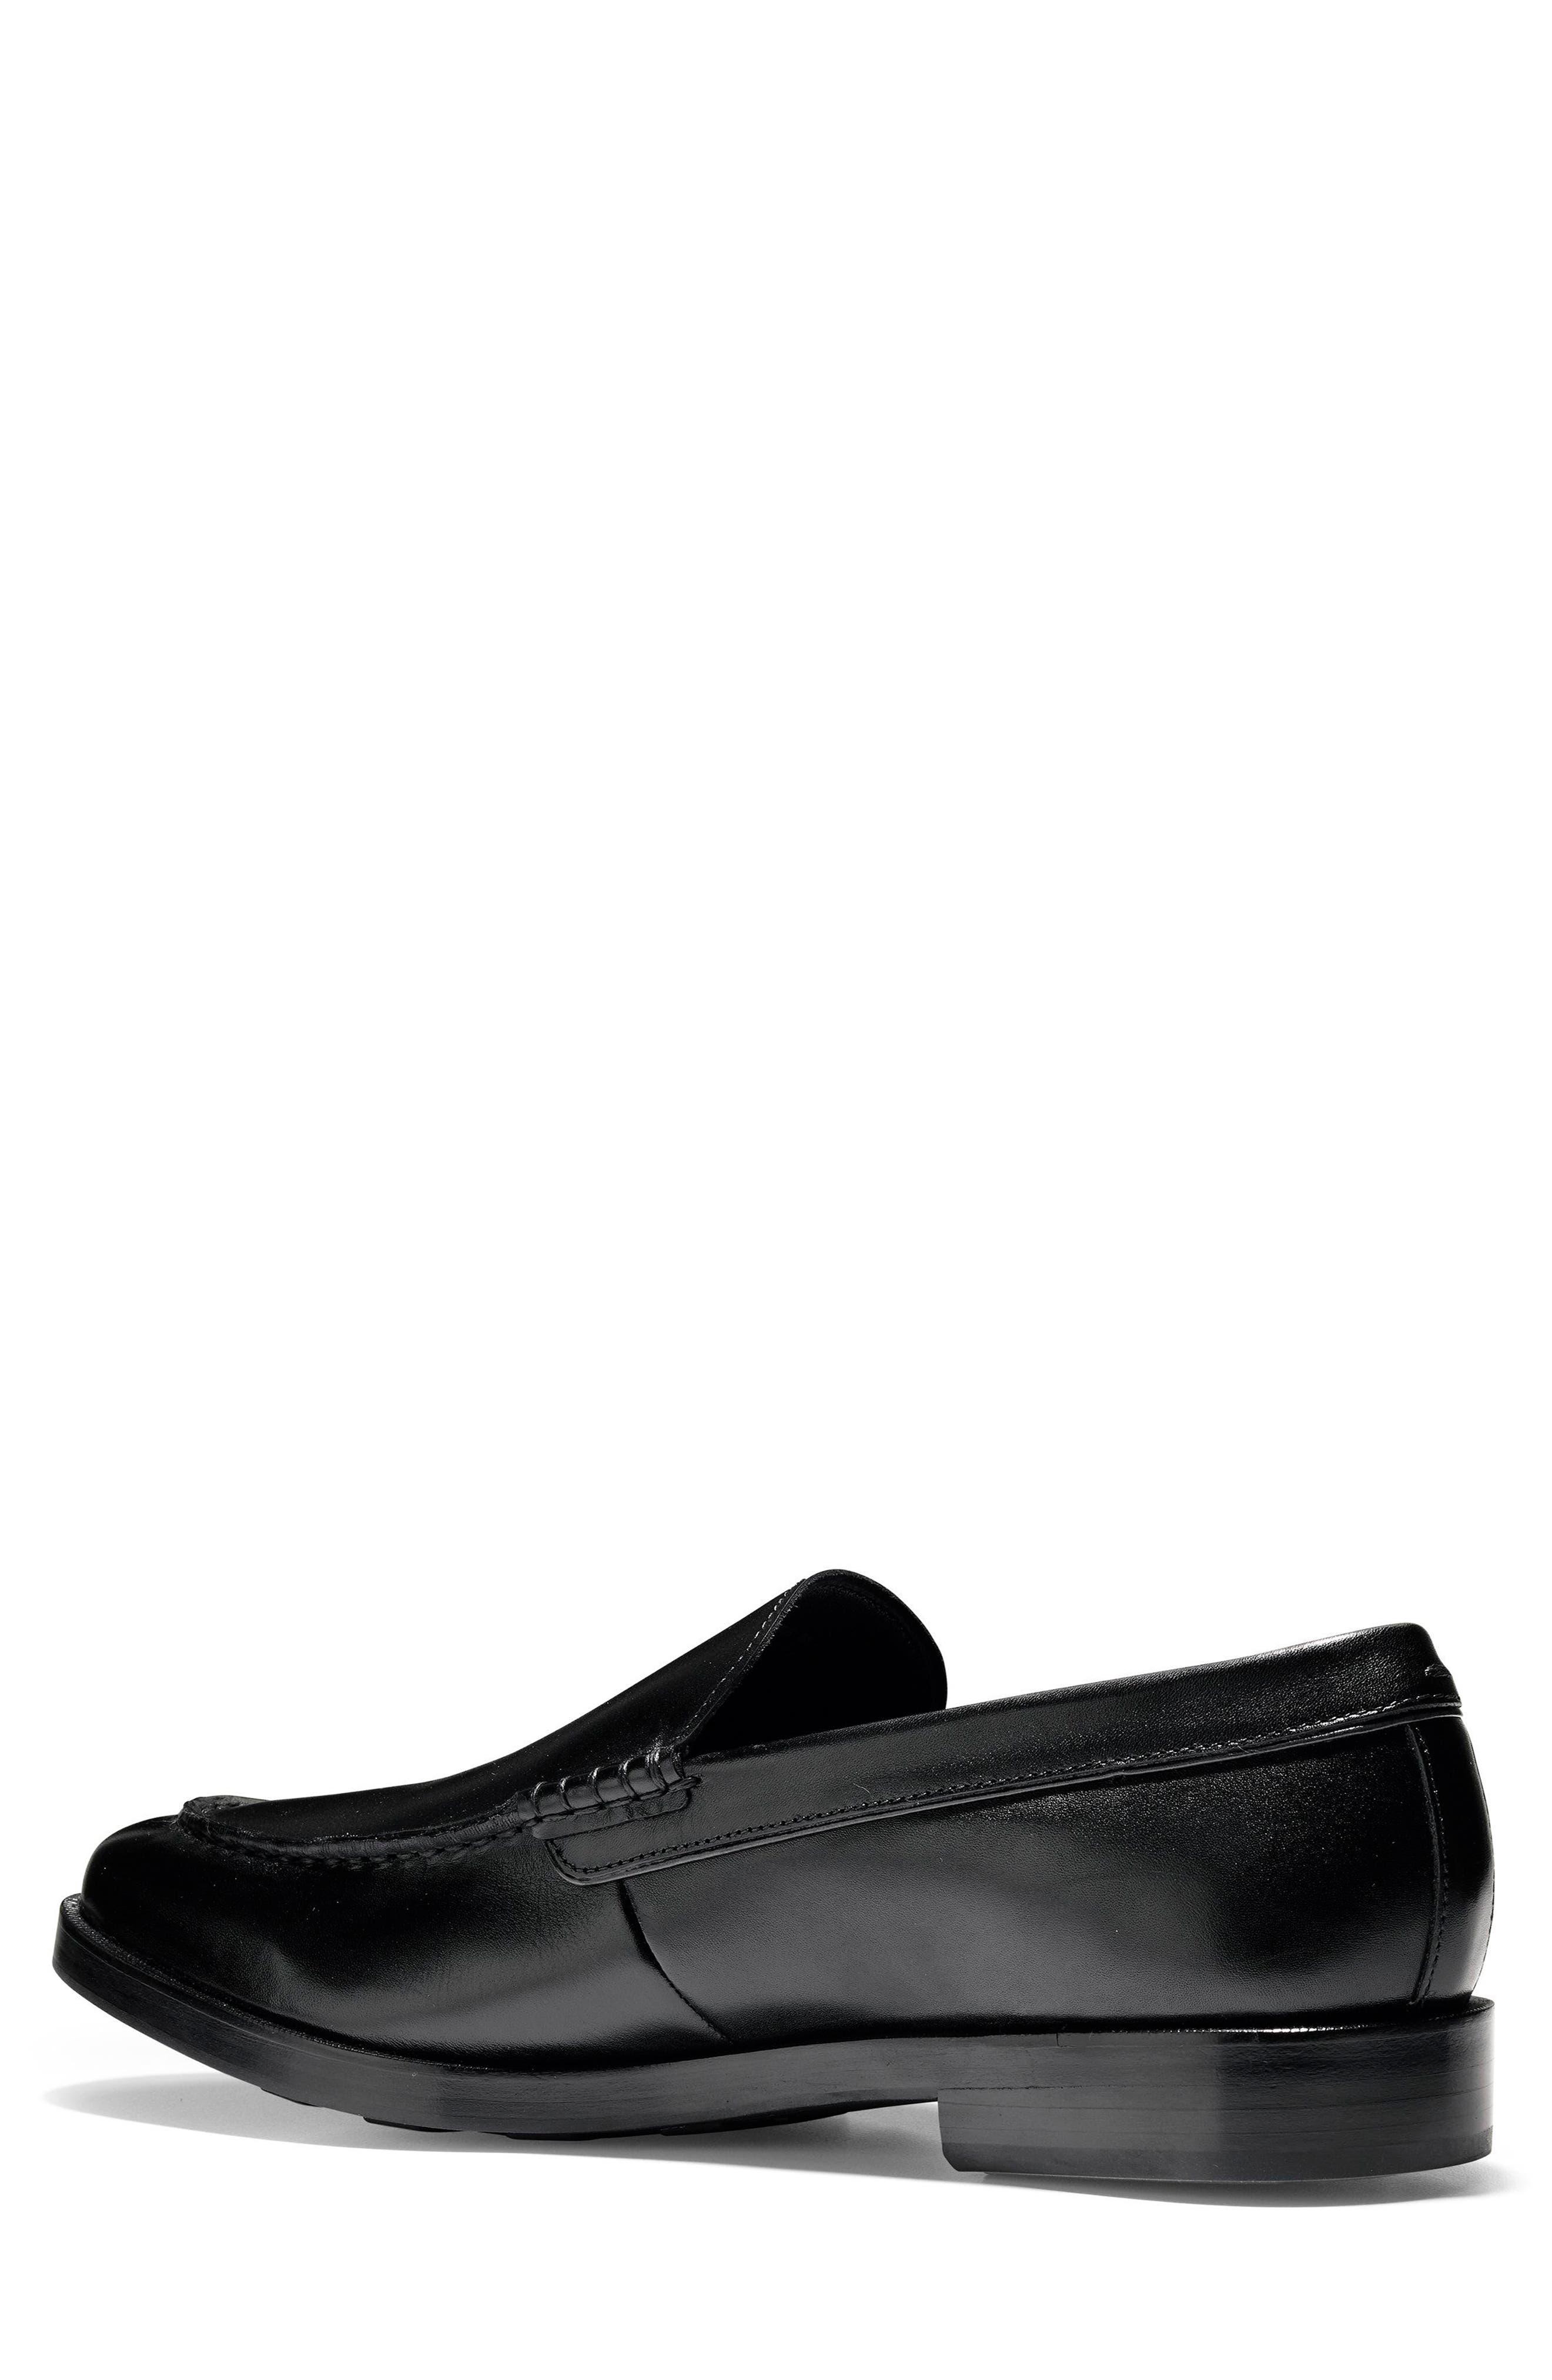 Hamilton Grand Venetian Loafer,                             Alternate thumbnail 2, color,                             BLACK